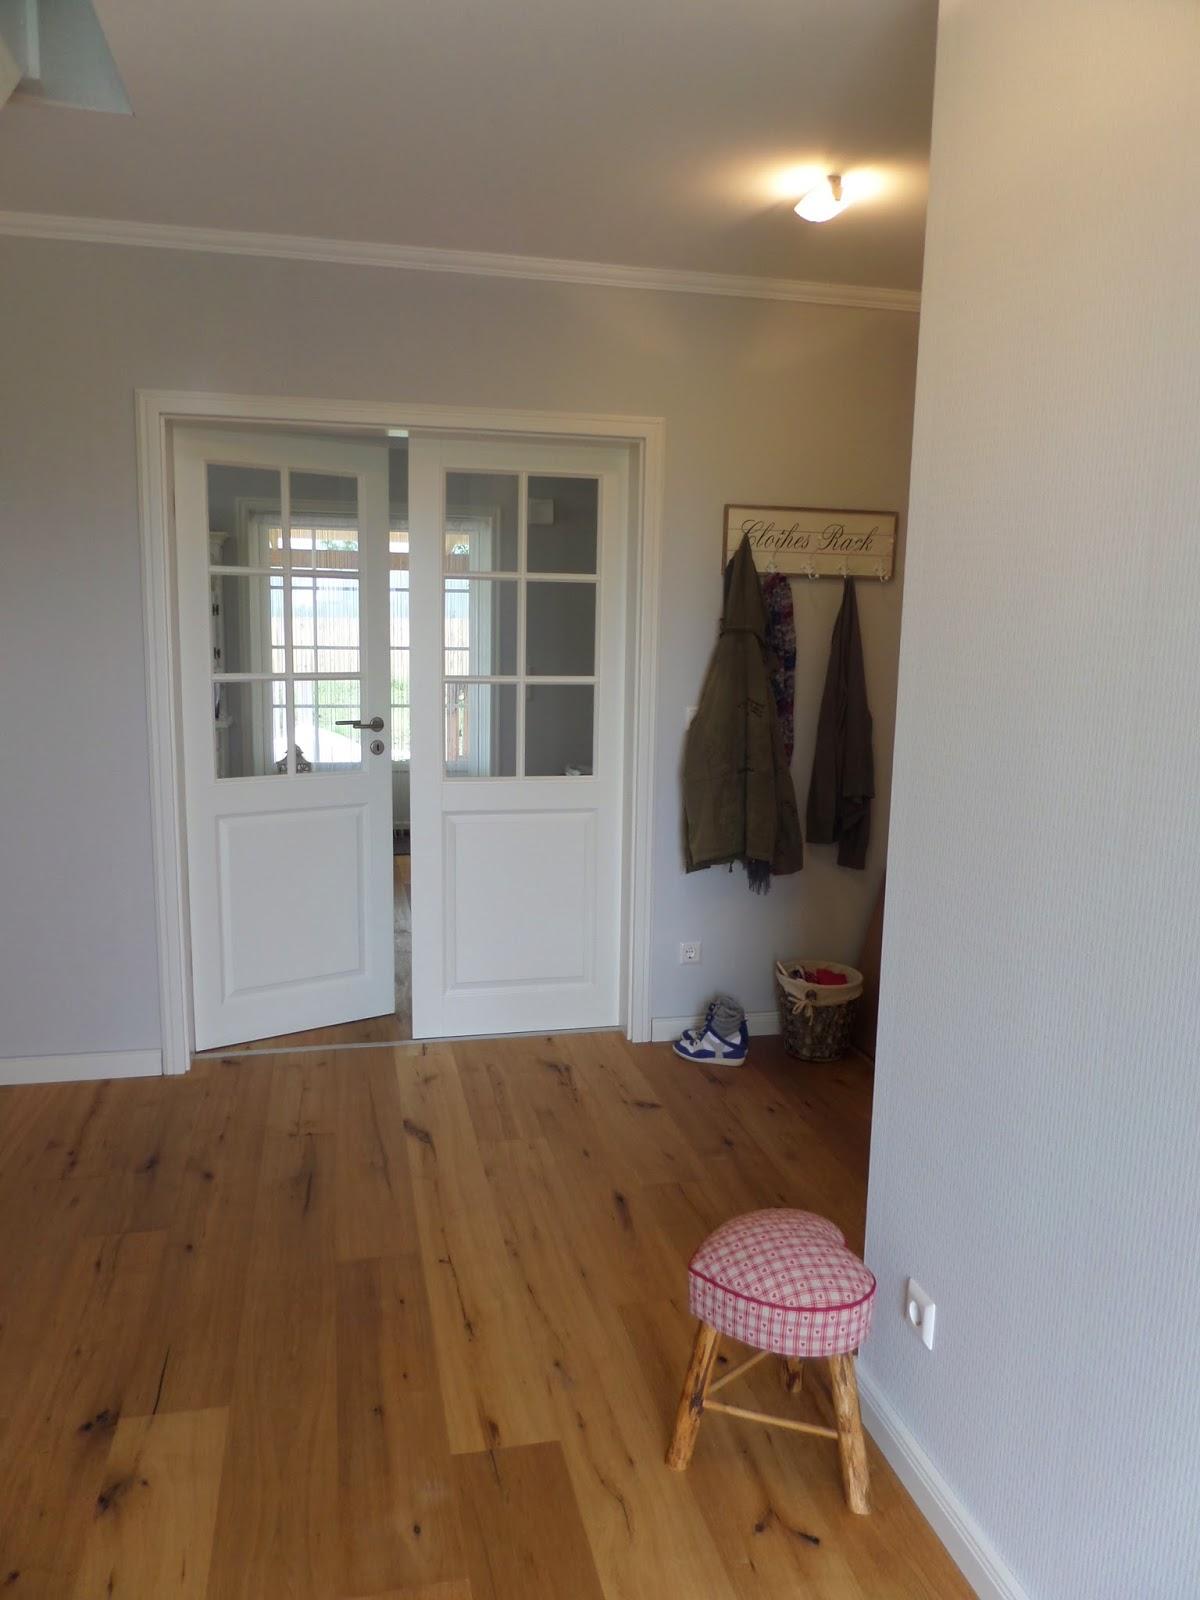 kleine lotta unser schwedenhaus september 2014. Black Bedroom Furniture Sets. Home Design Ideas